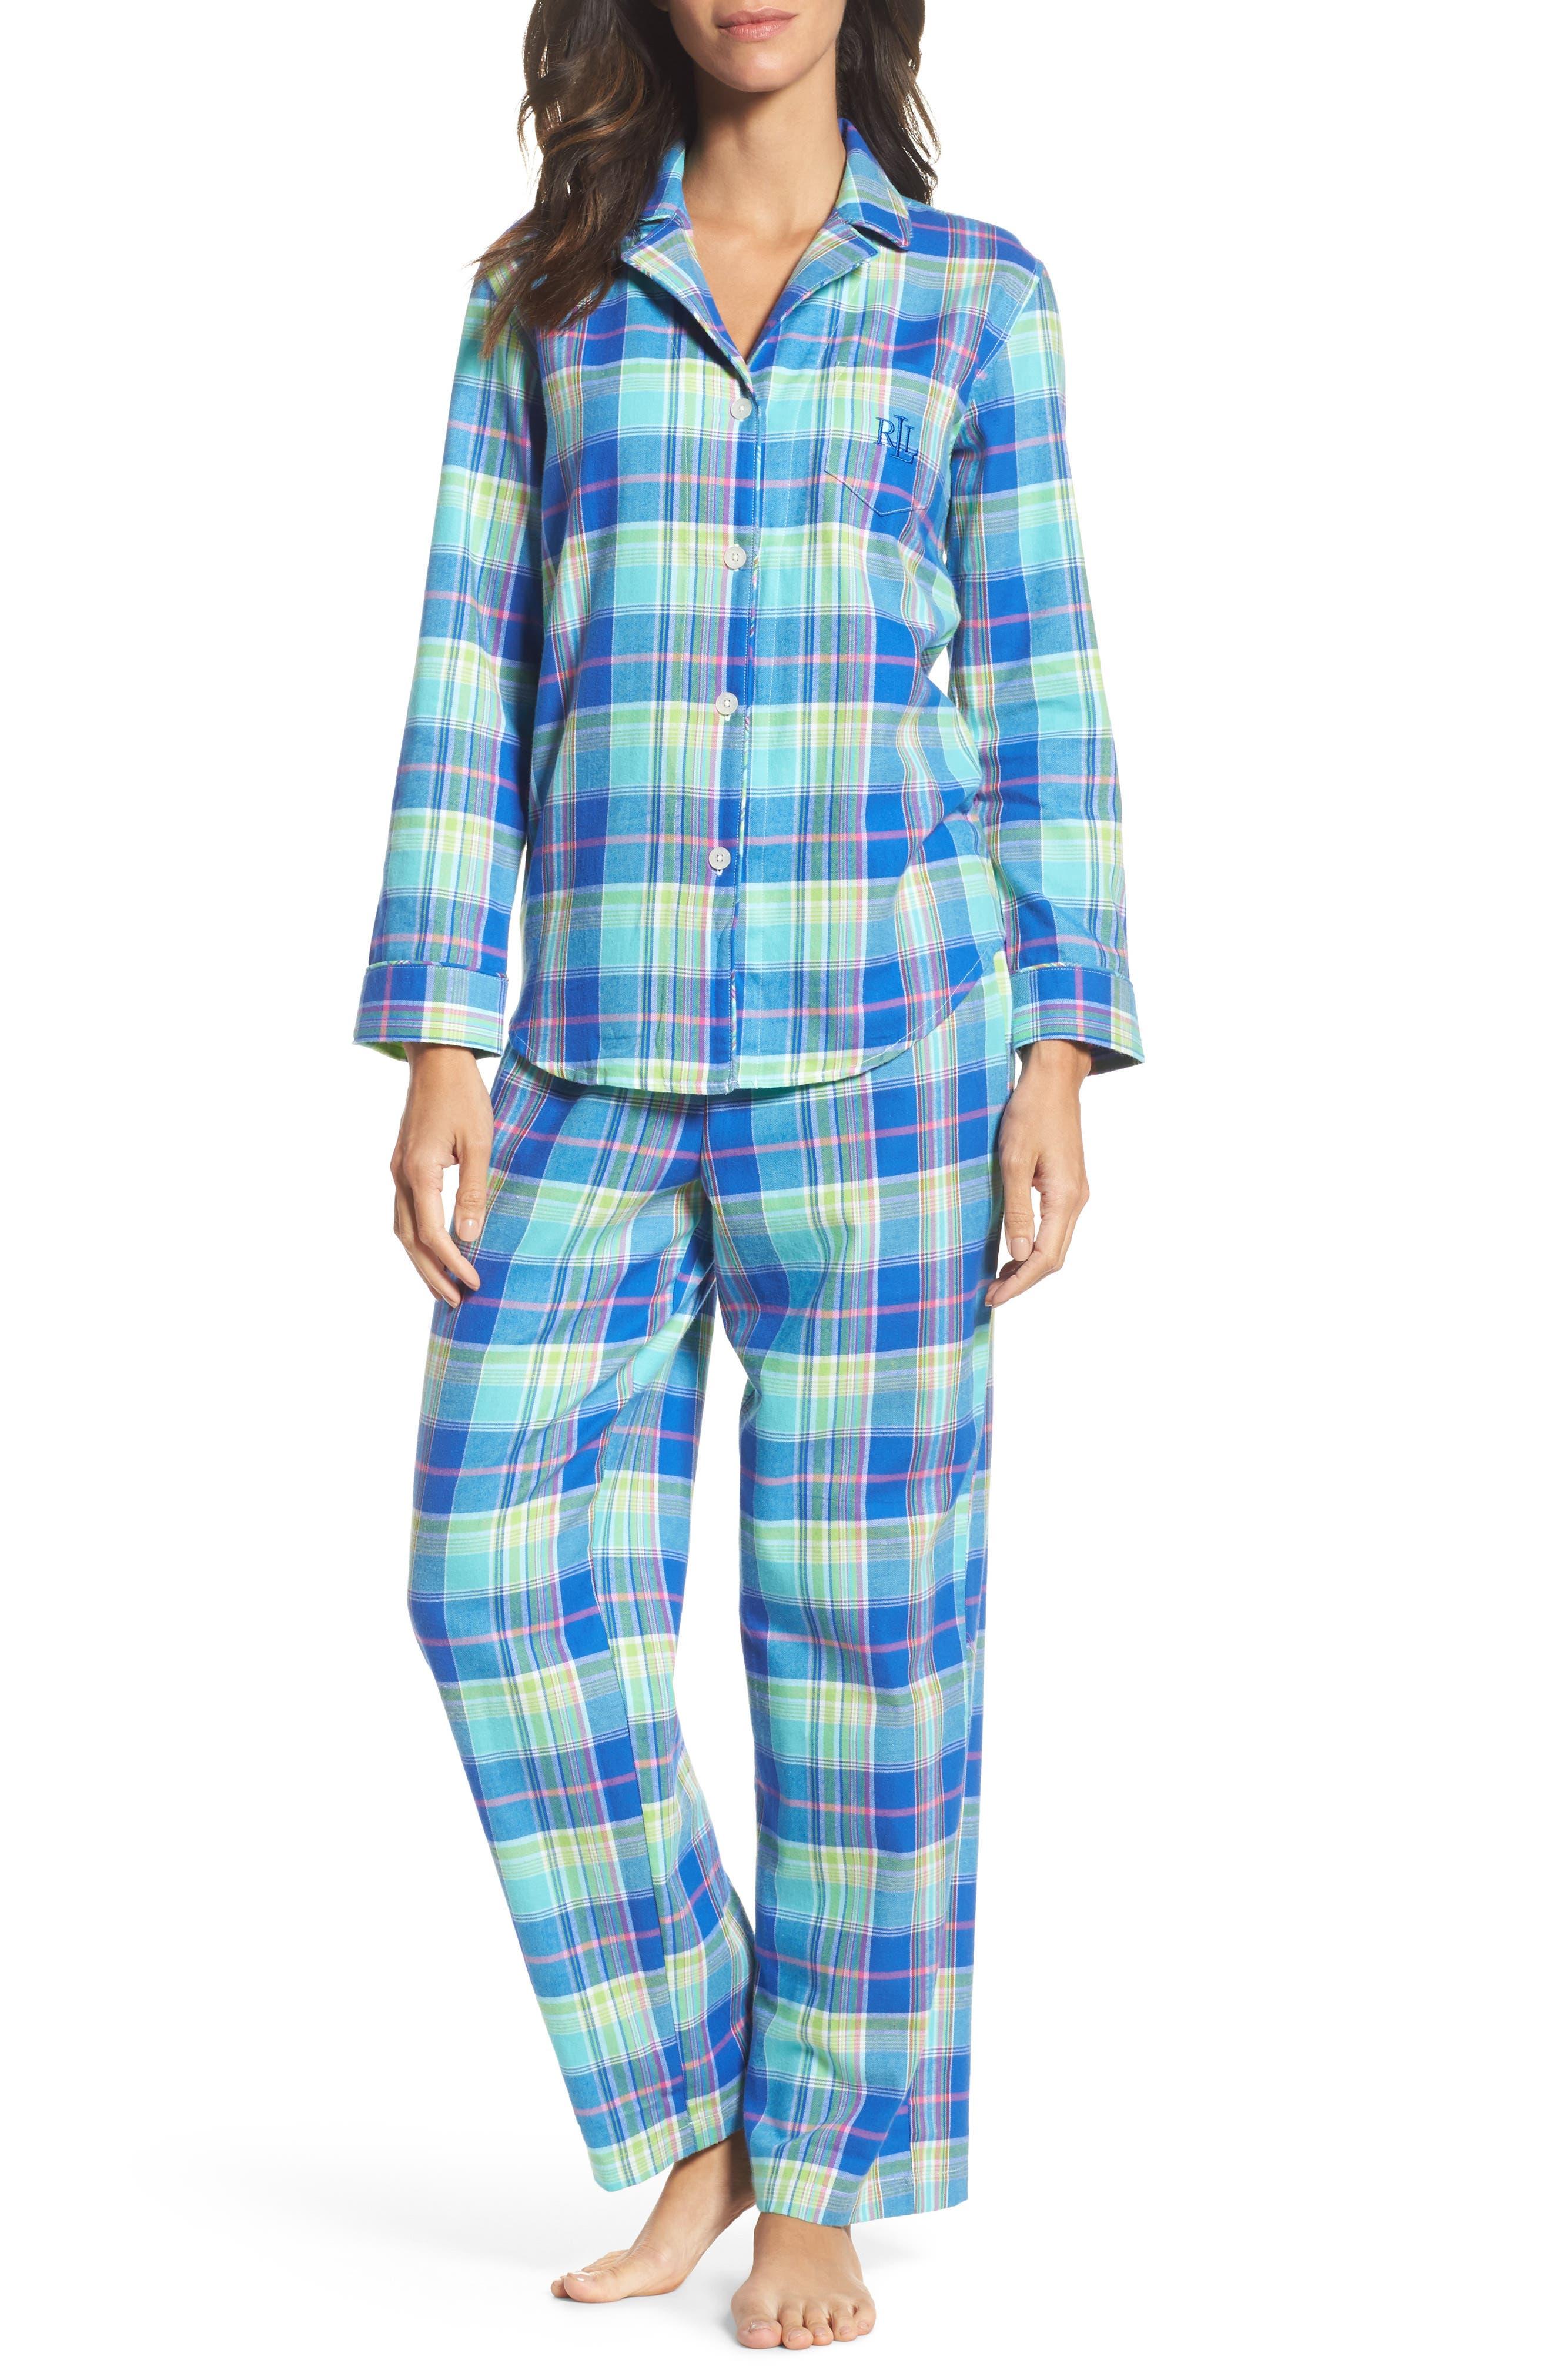 Notch Collar Pajamas,                             Main thumbnail 1, color,                             Turquoise Multi Plaid